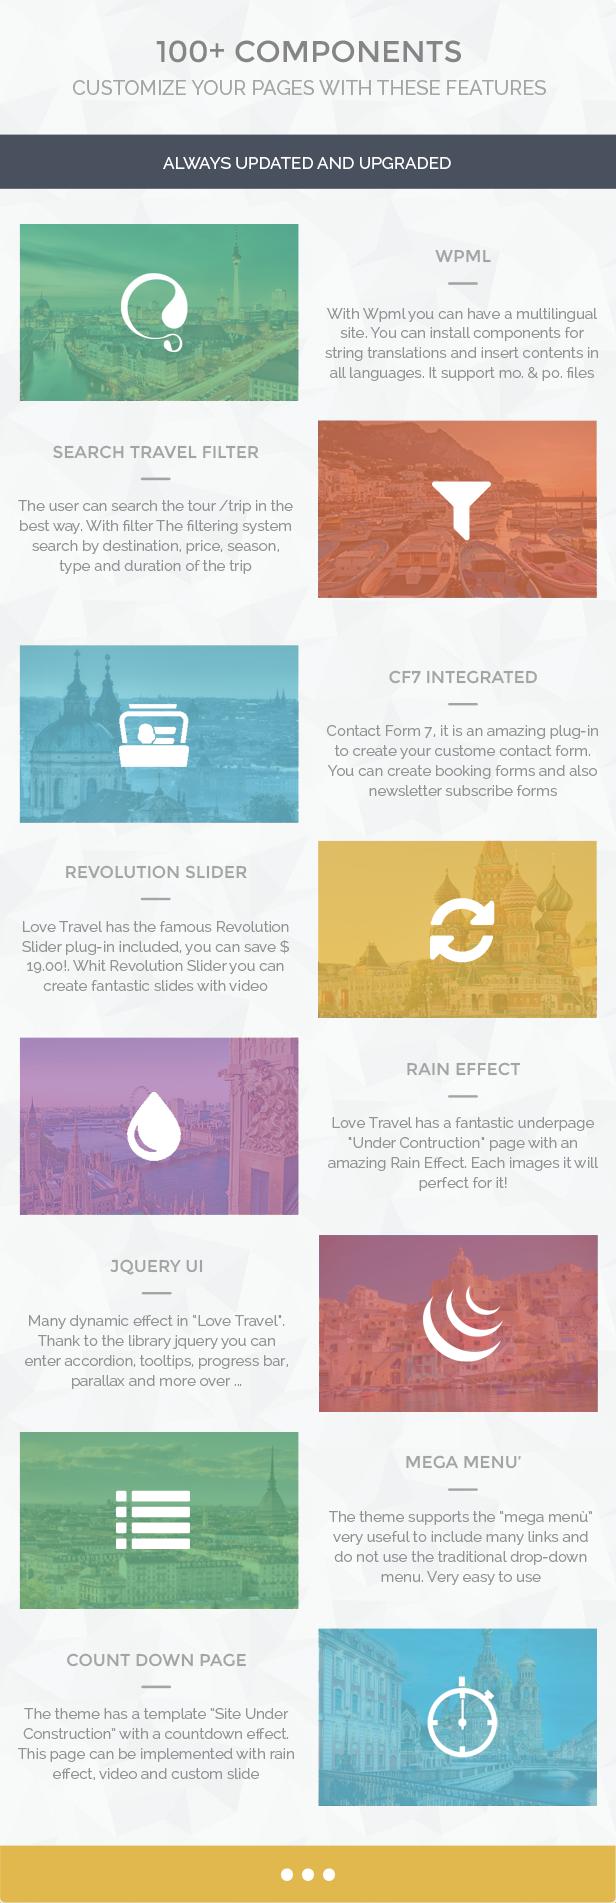 Love Travel - Creative Travel Agency WordPress - 9